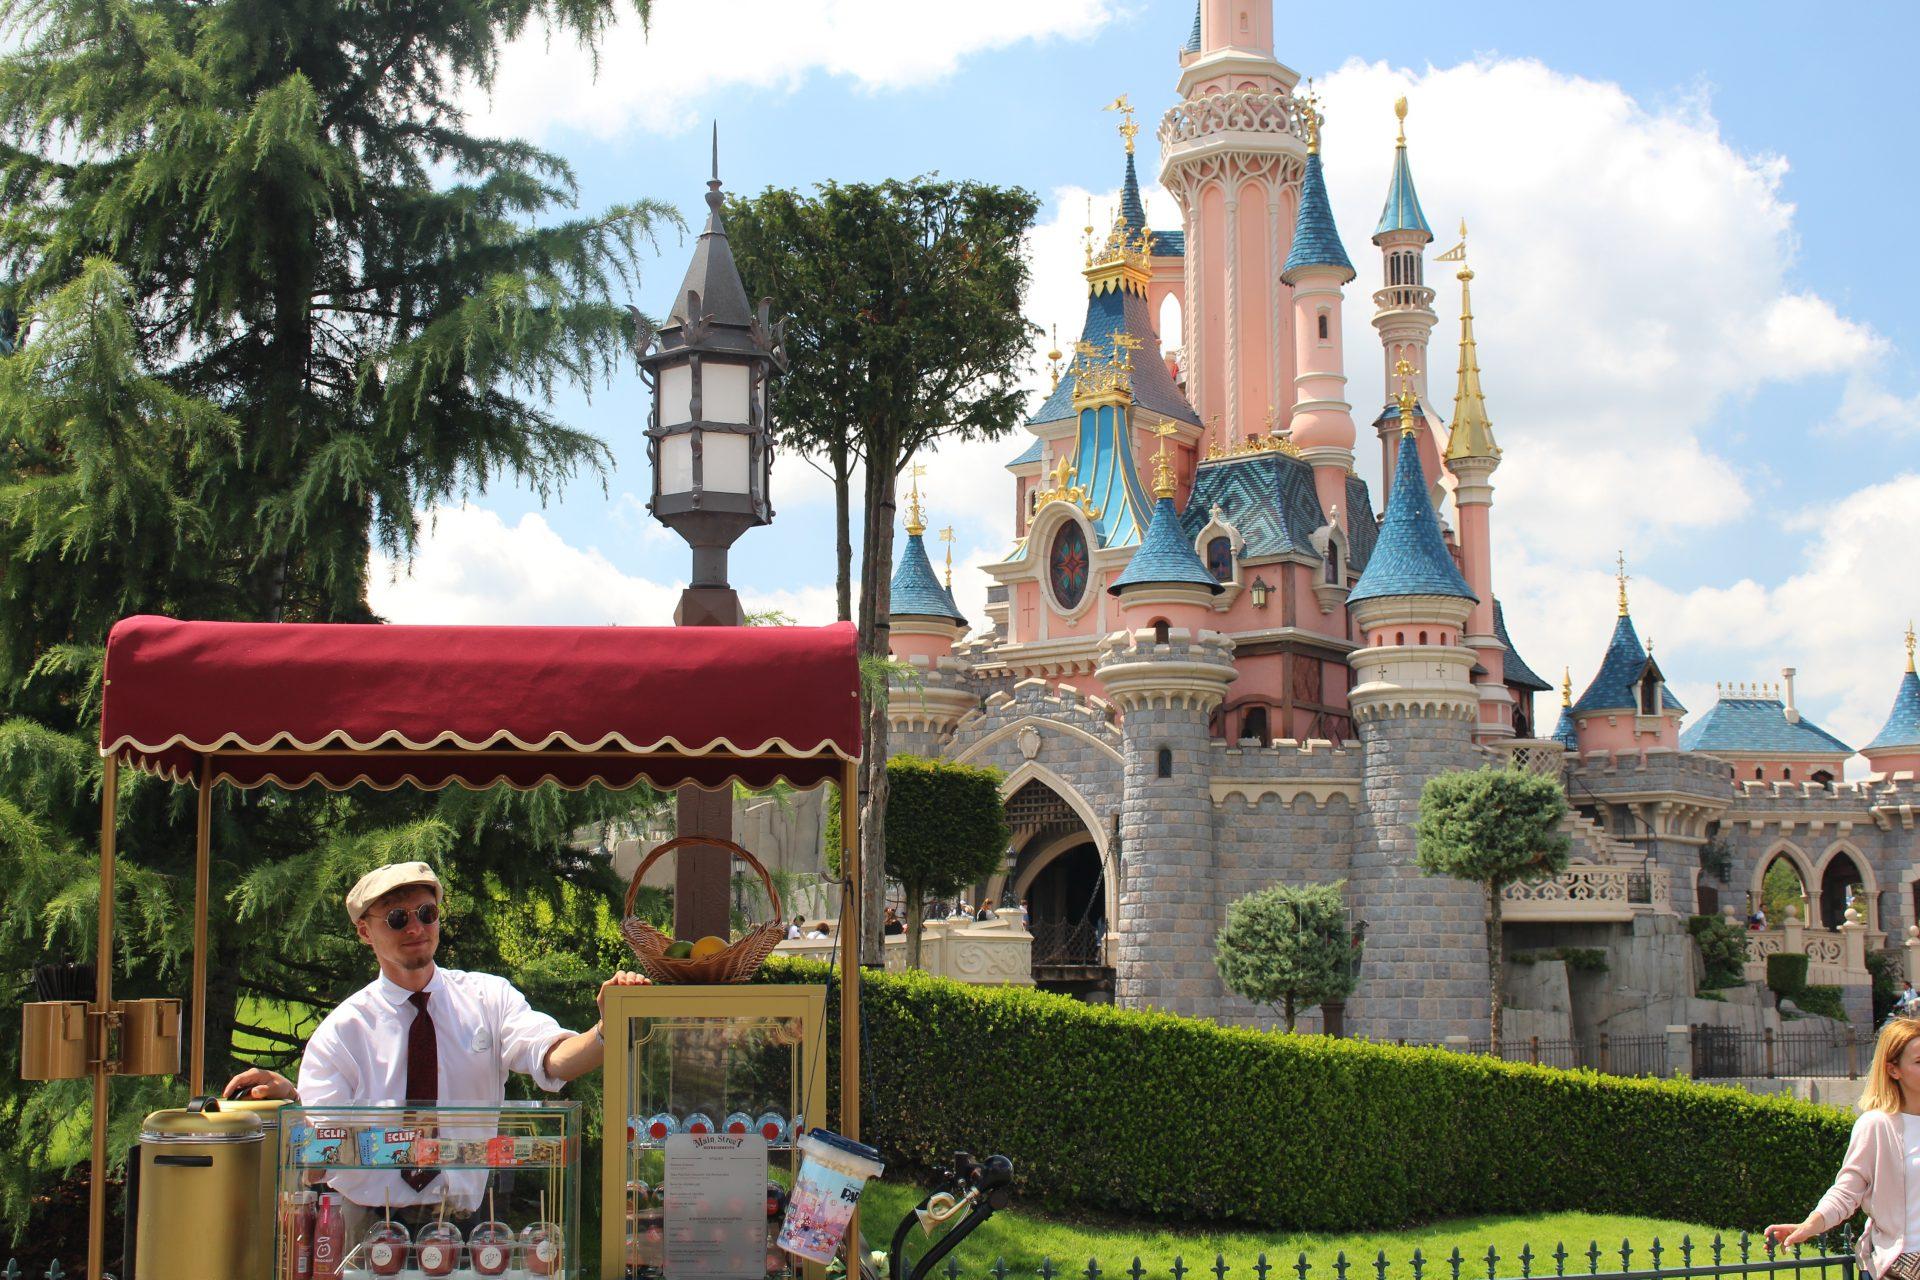 4 Sterne Vienna House Magic Circus at Disneyland Paris